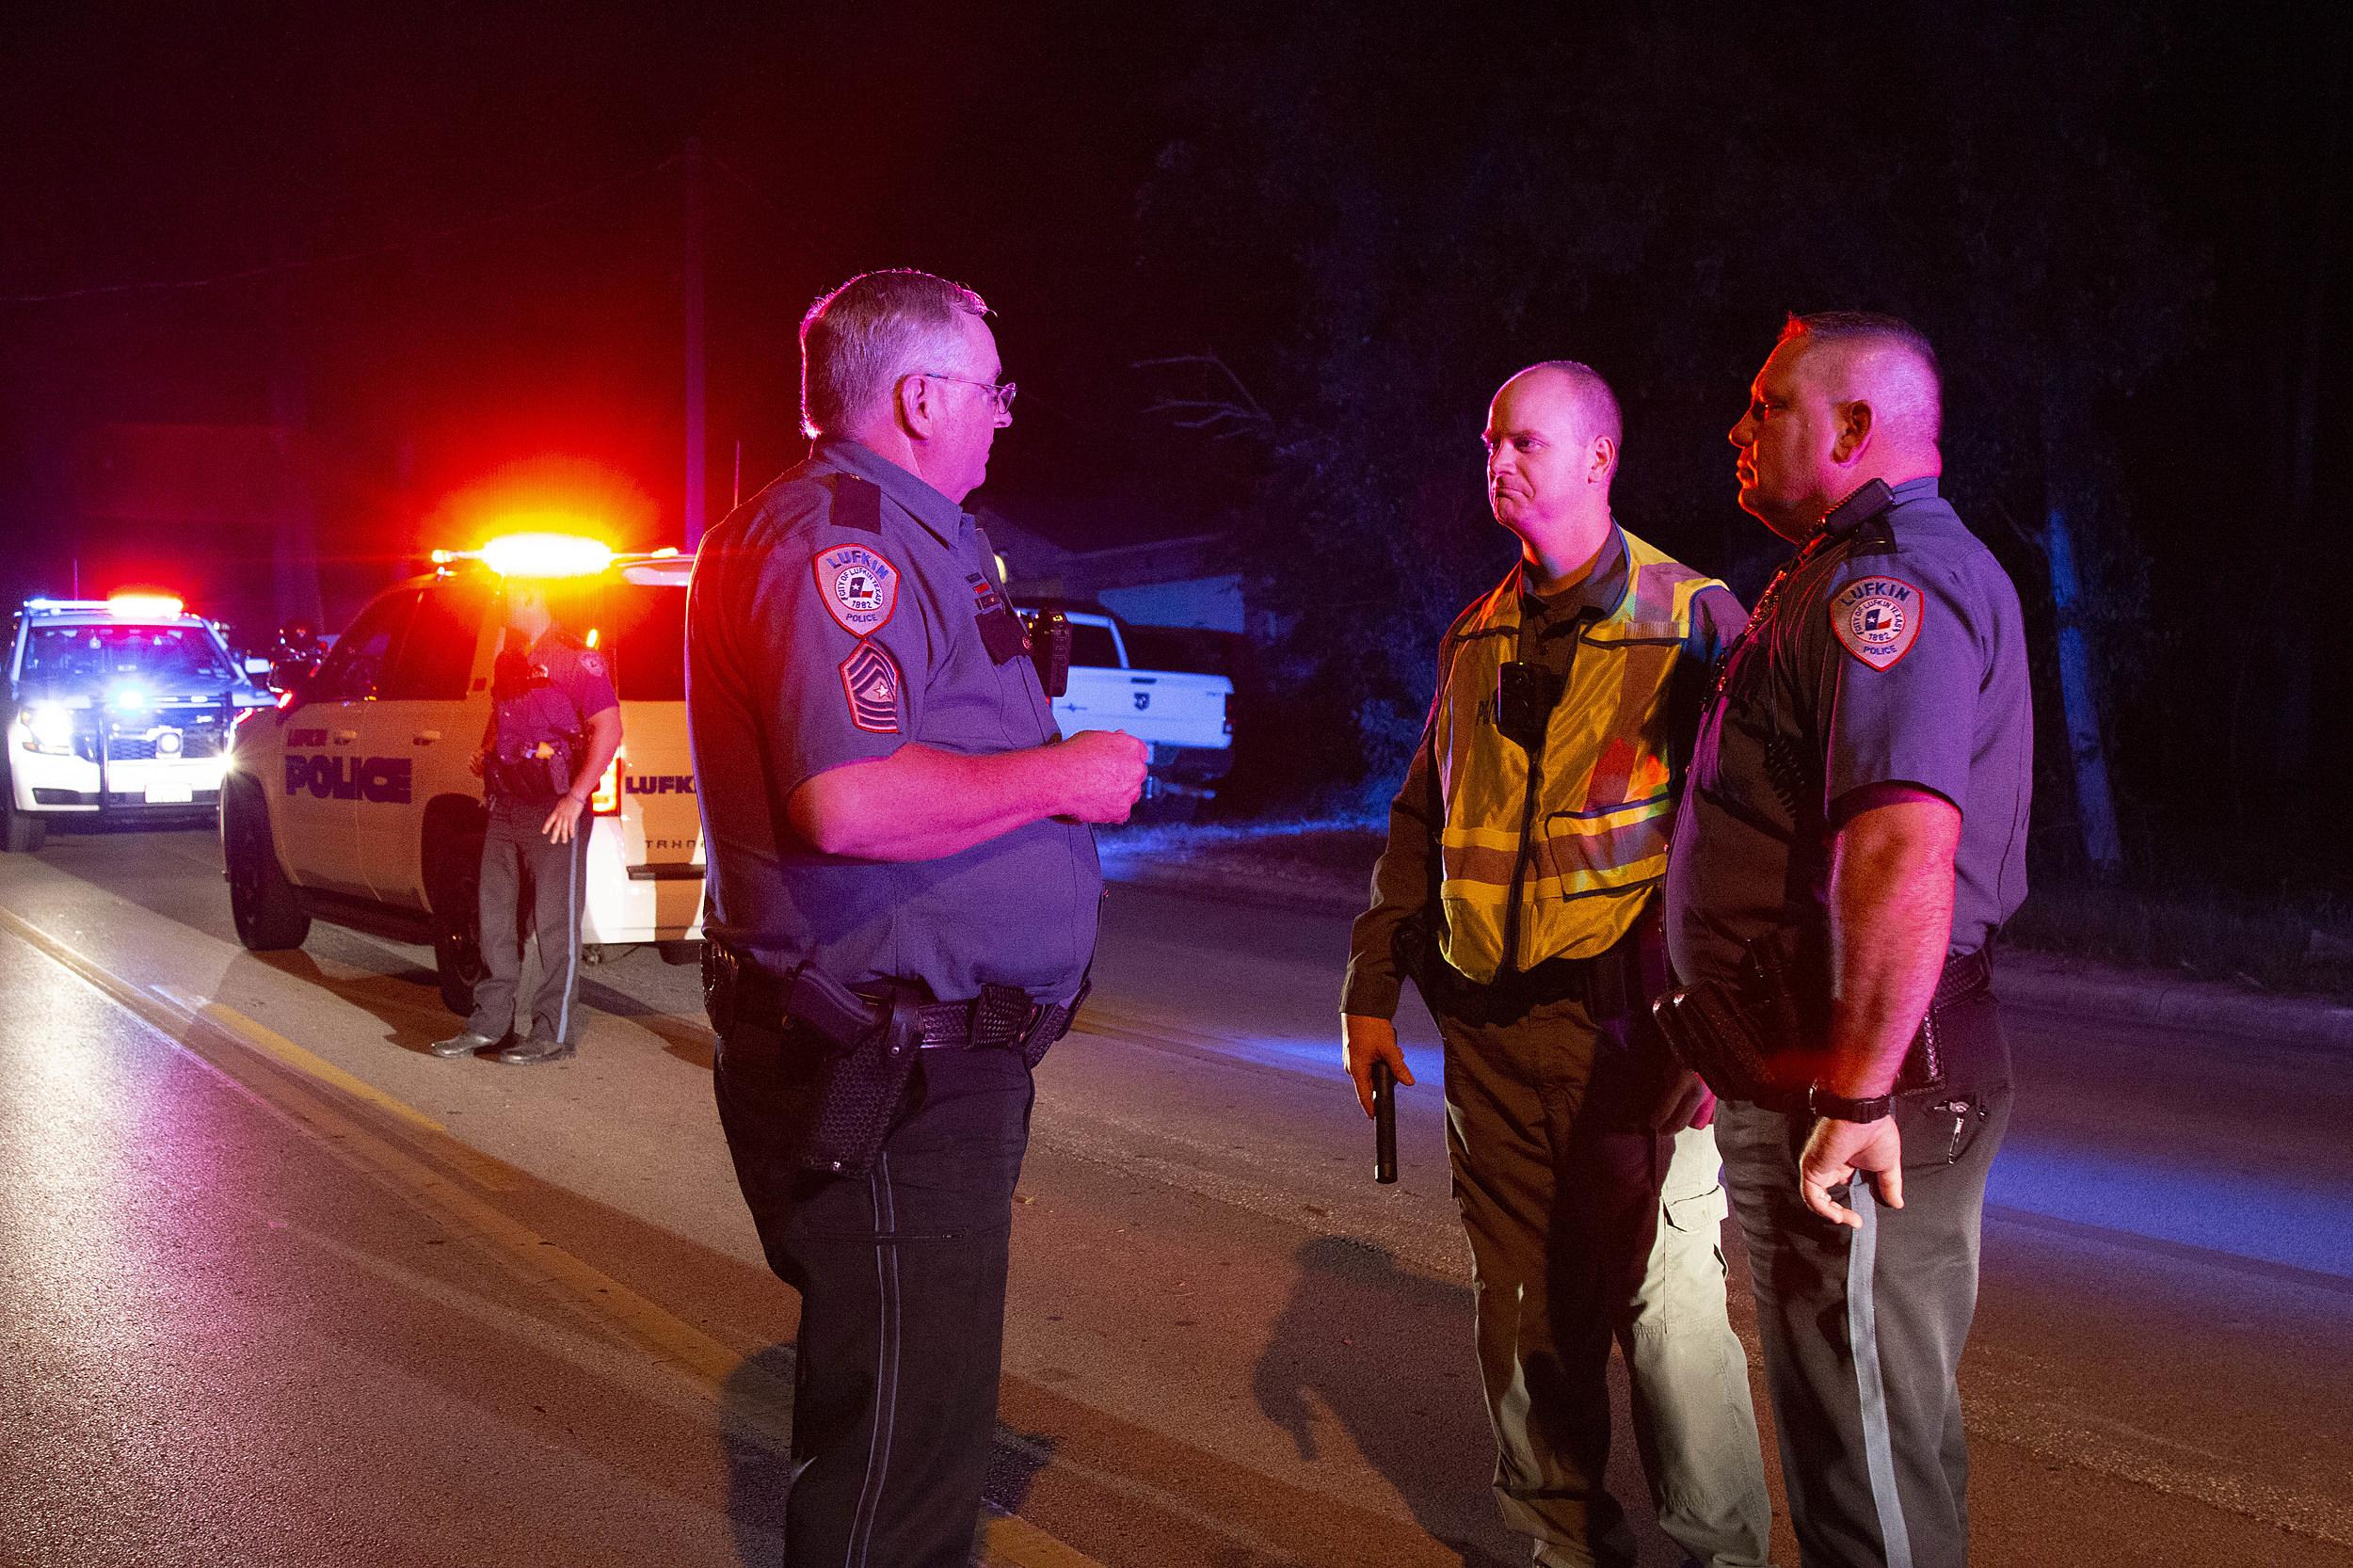 Lufkin Police Respond to Fatal Car Crash on Tulane Drive